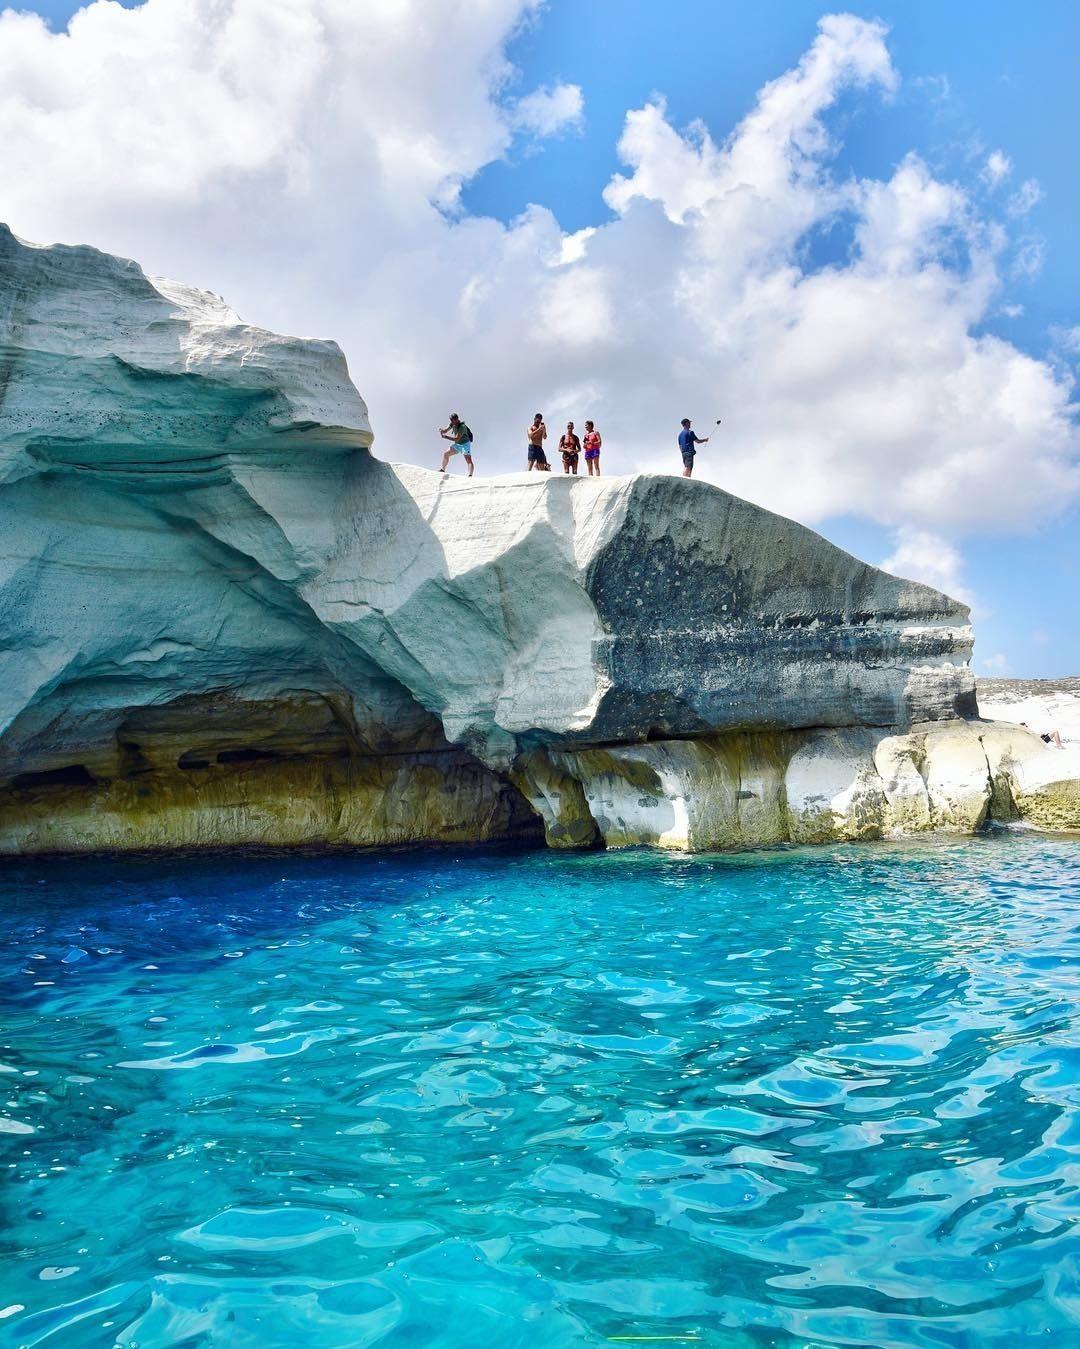 Sarakiniko Is A Beach On Milos Island Greece Dream Vacations Destinations Greece Travel Greek Islands